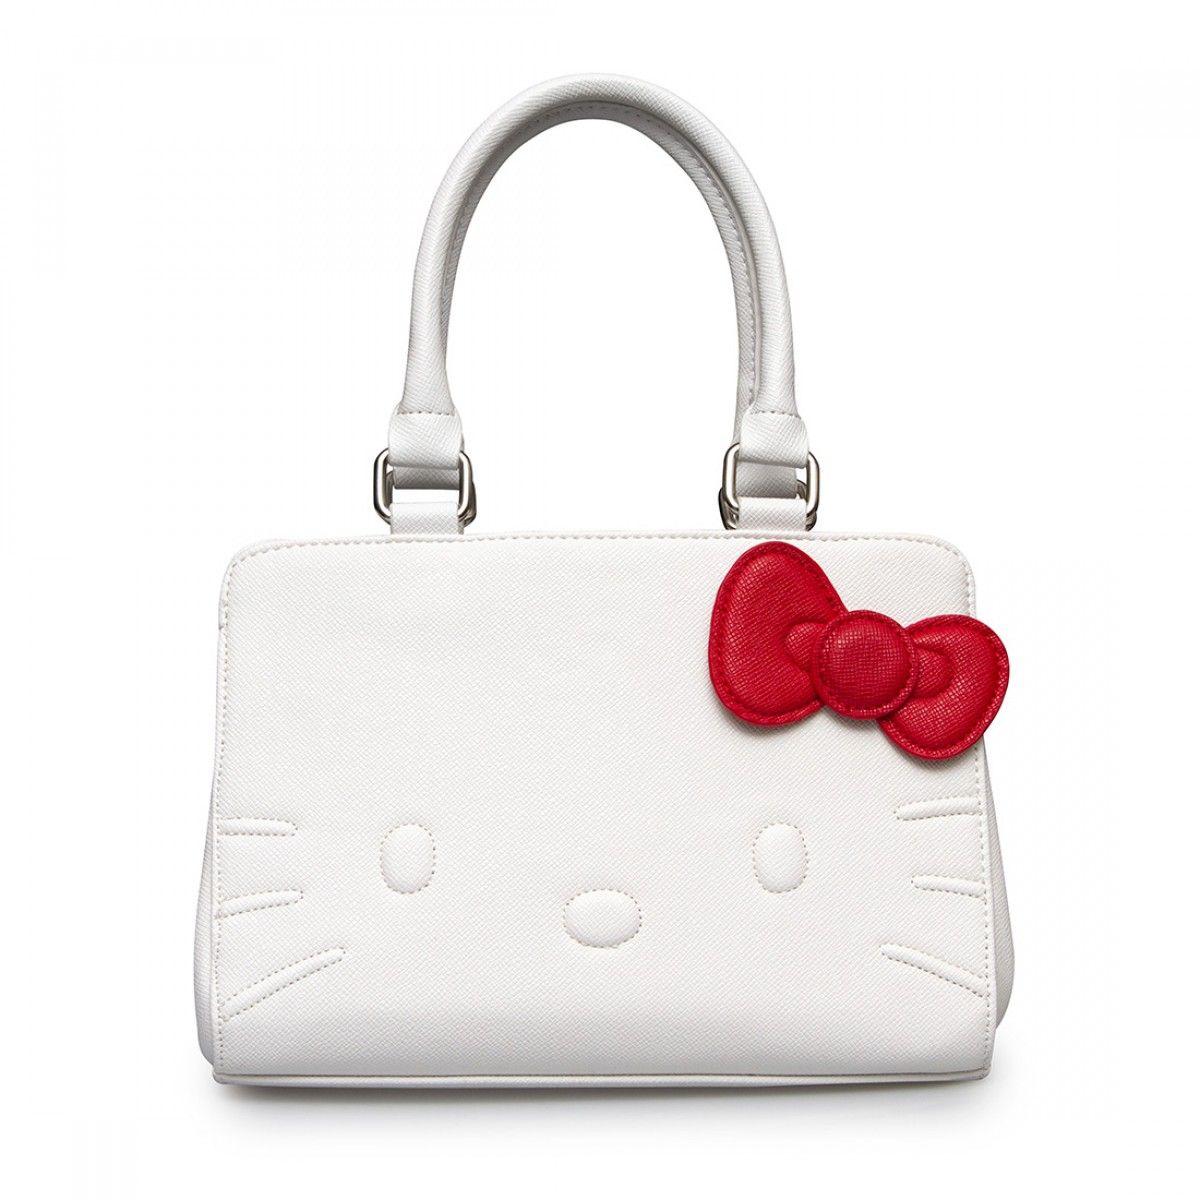 d90b099db1b9 Hello Kitty White Quilt Walking Stitch Face Bag - Bags - Hello Kitty -  Brands